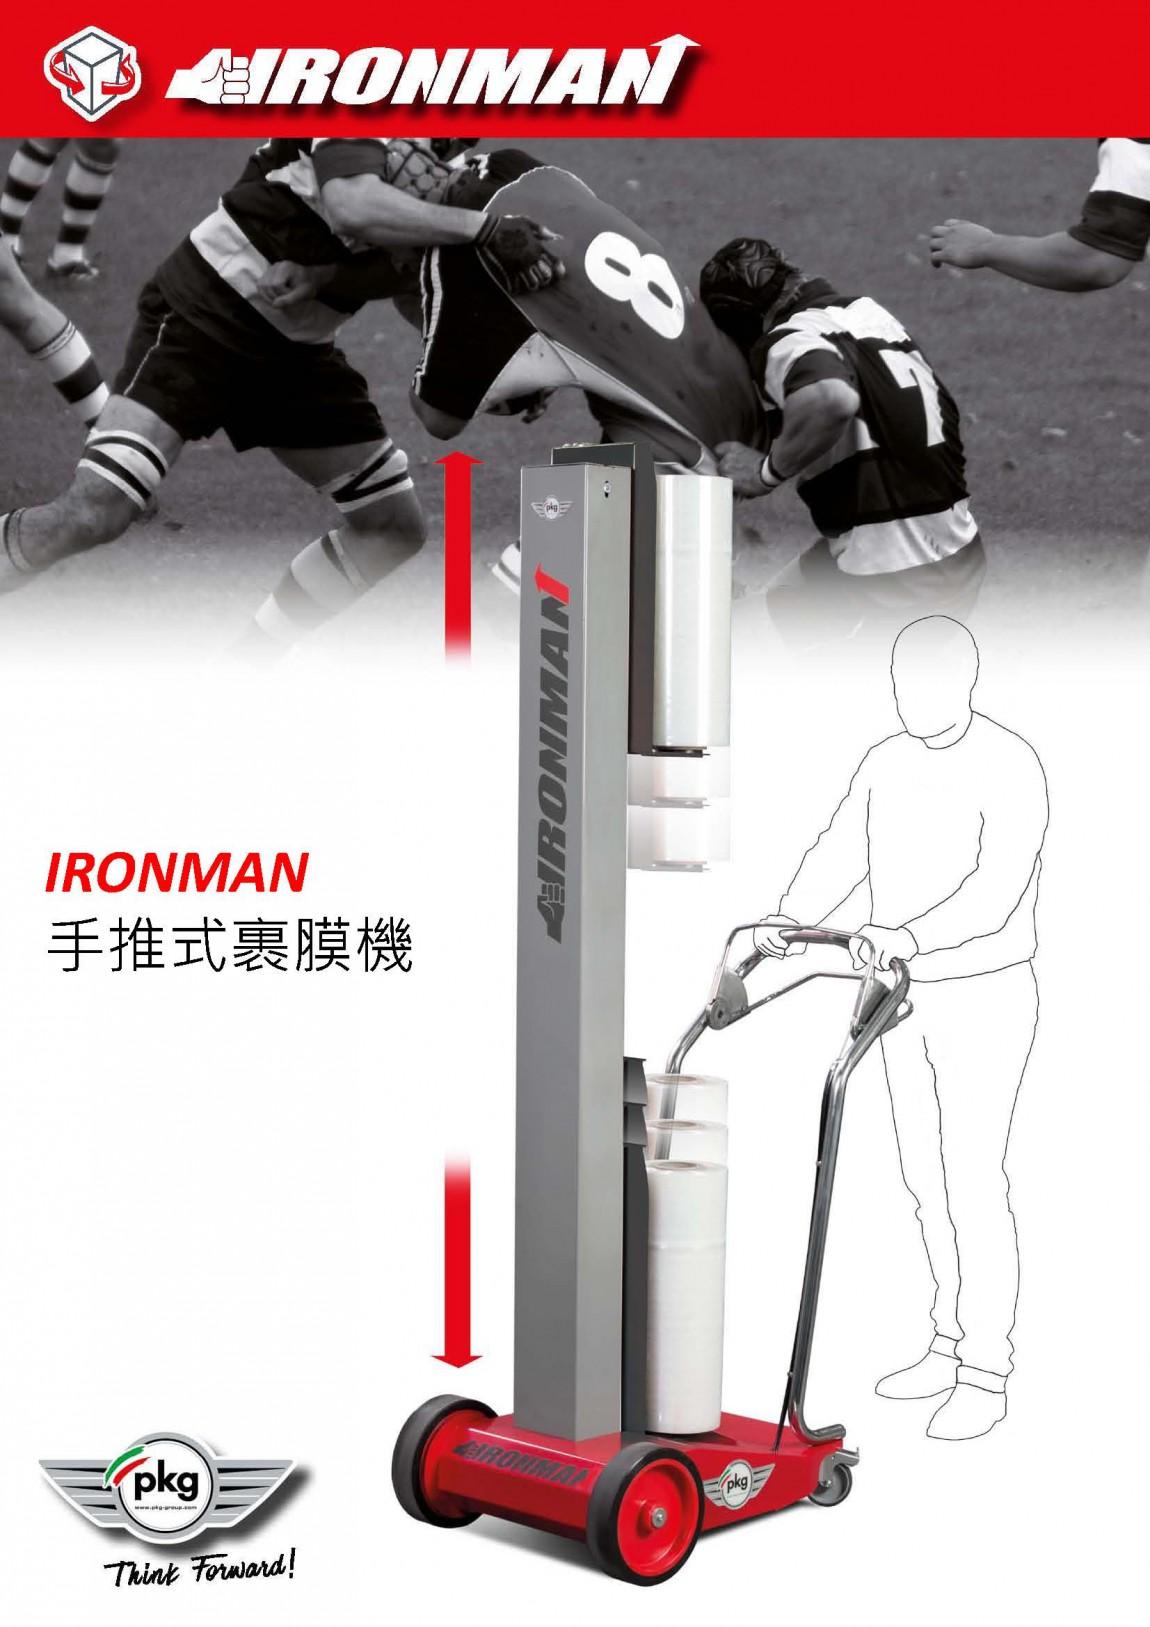 IRONMAN 手推式裹膜機 / 包膜機 產品示意圖